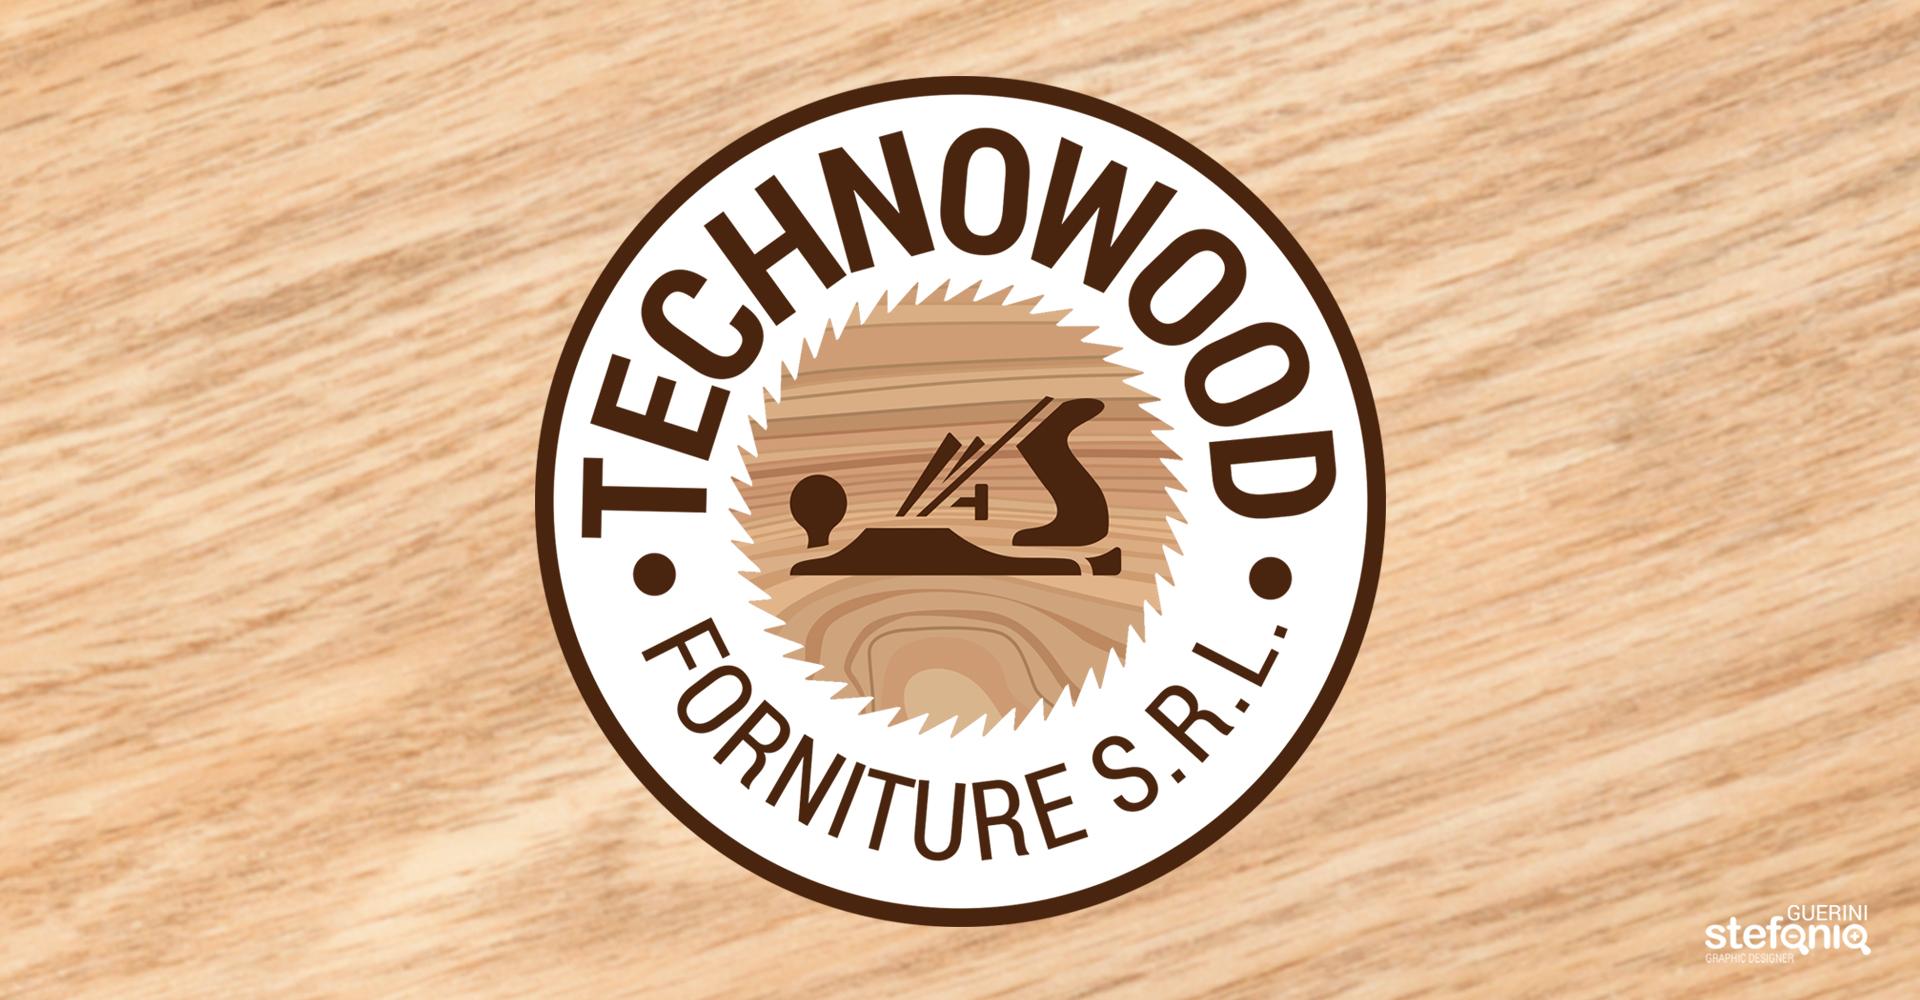 TECHNOWWOD_LOGO